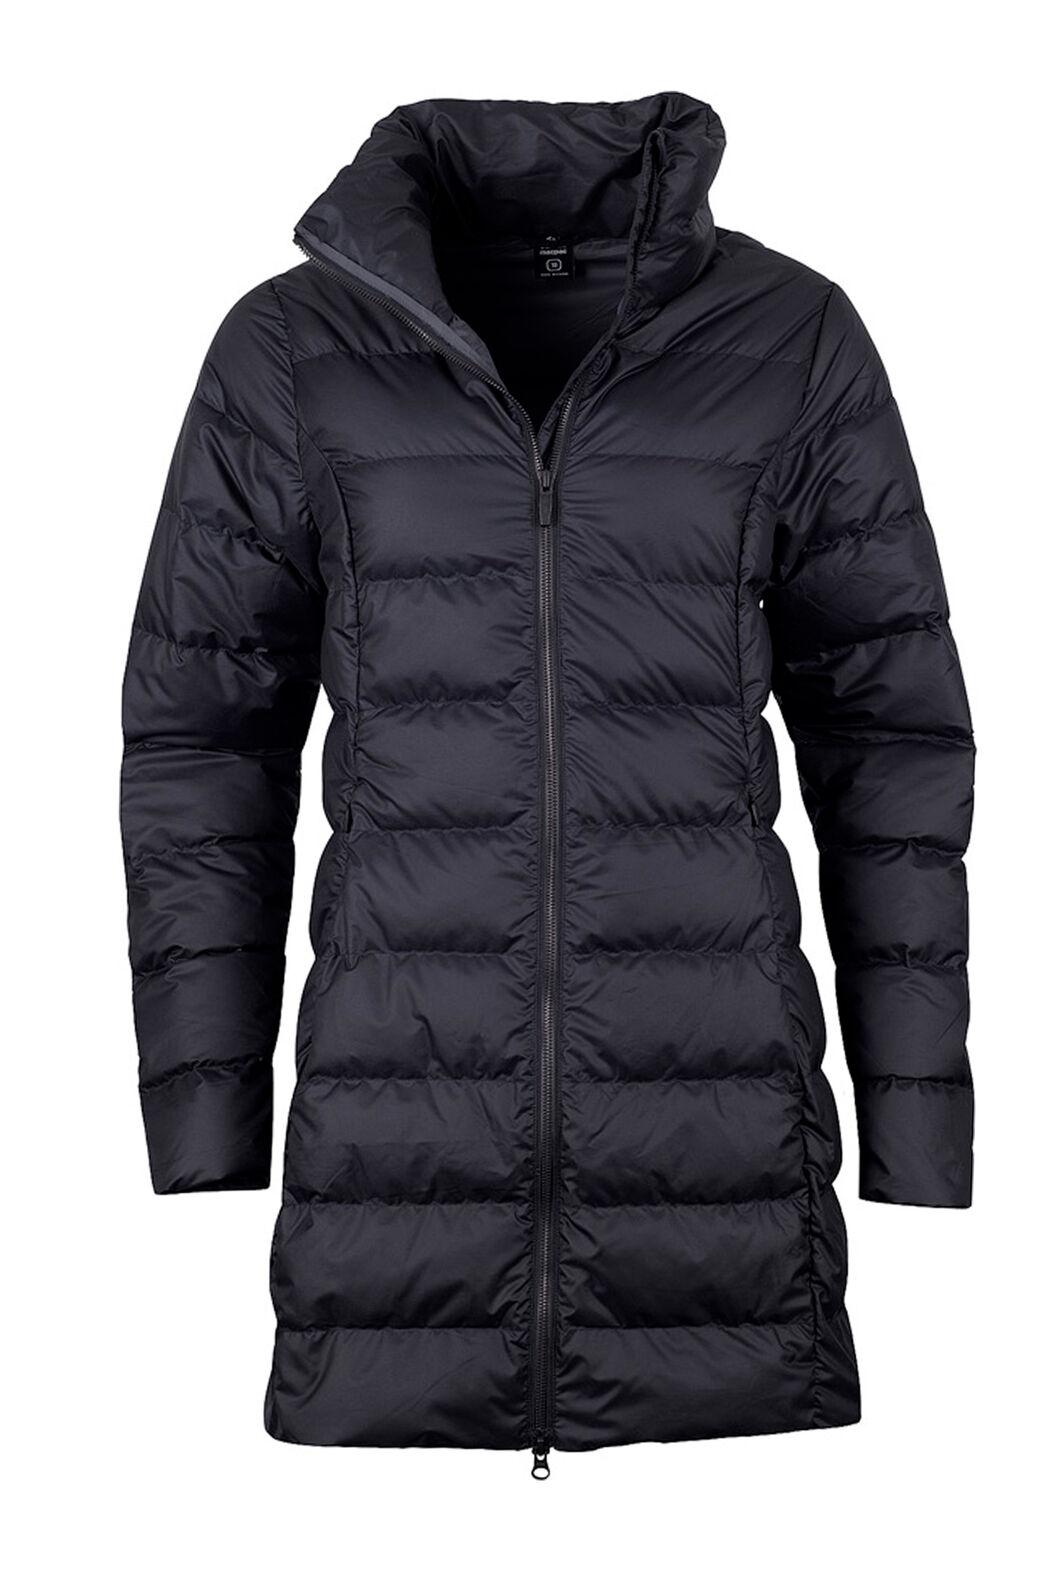 Macpac Women's Demi Down Coat, Black, hi-res